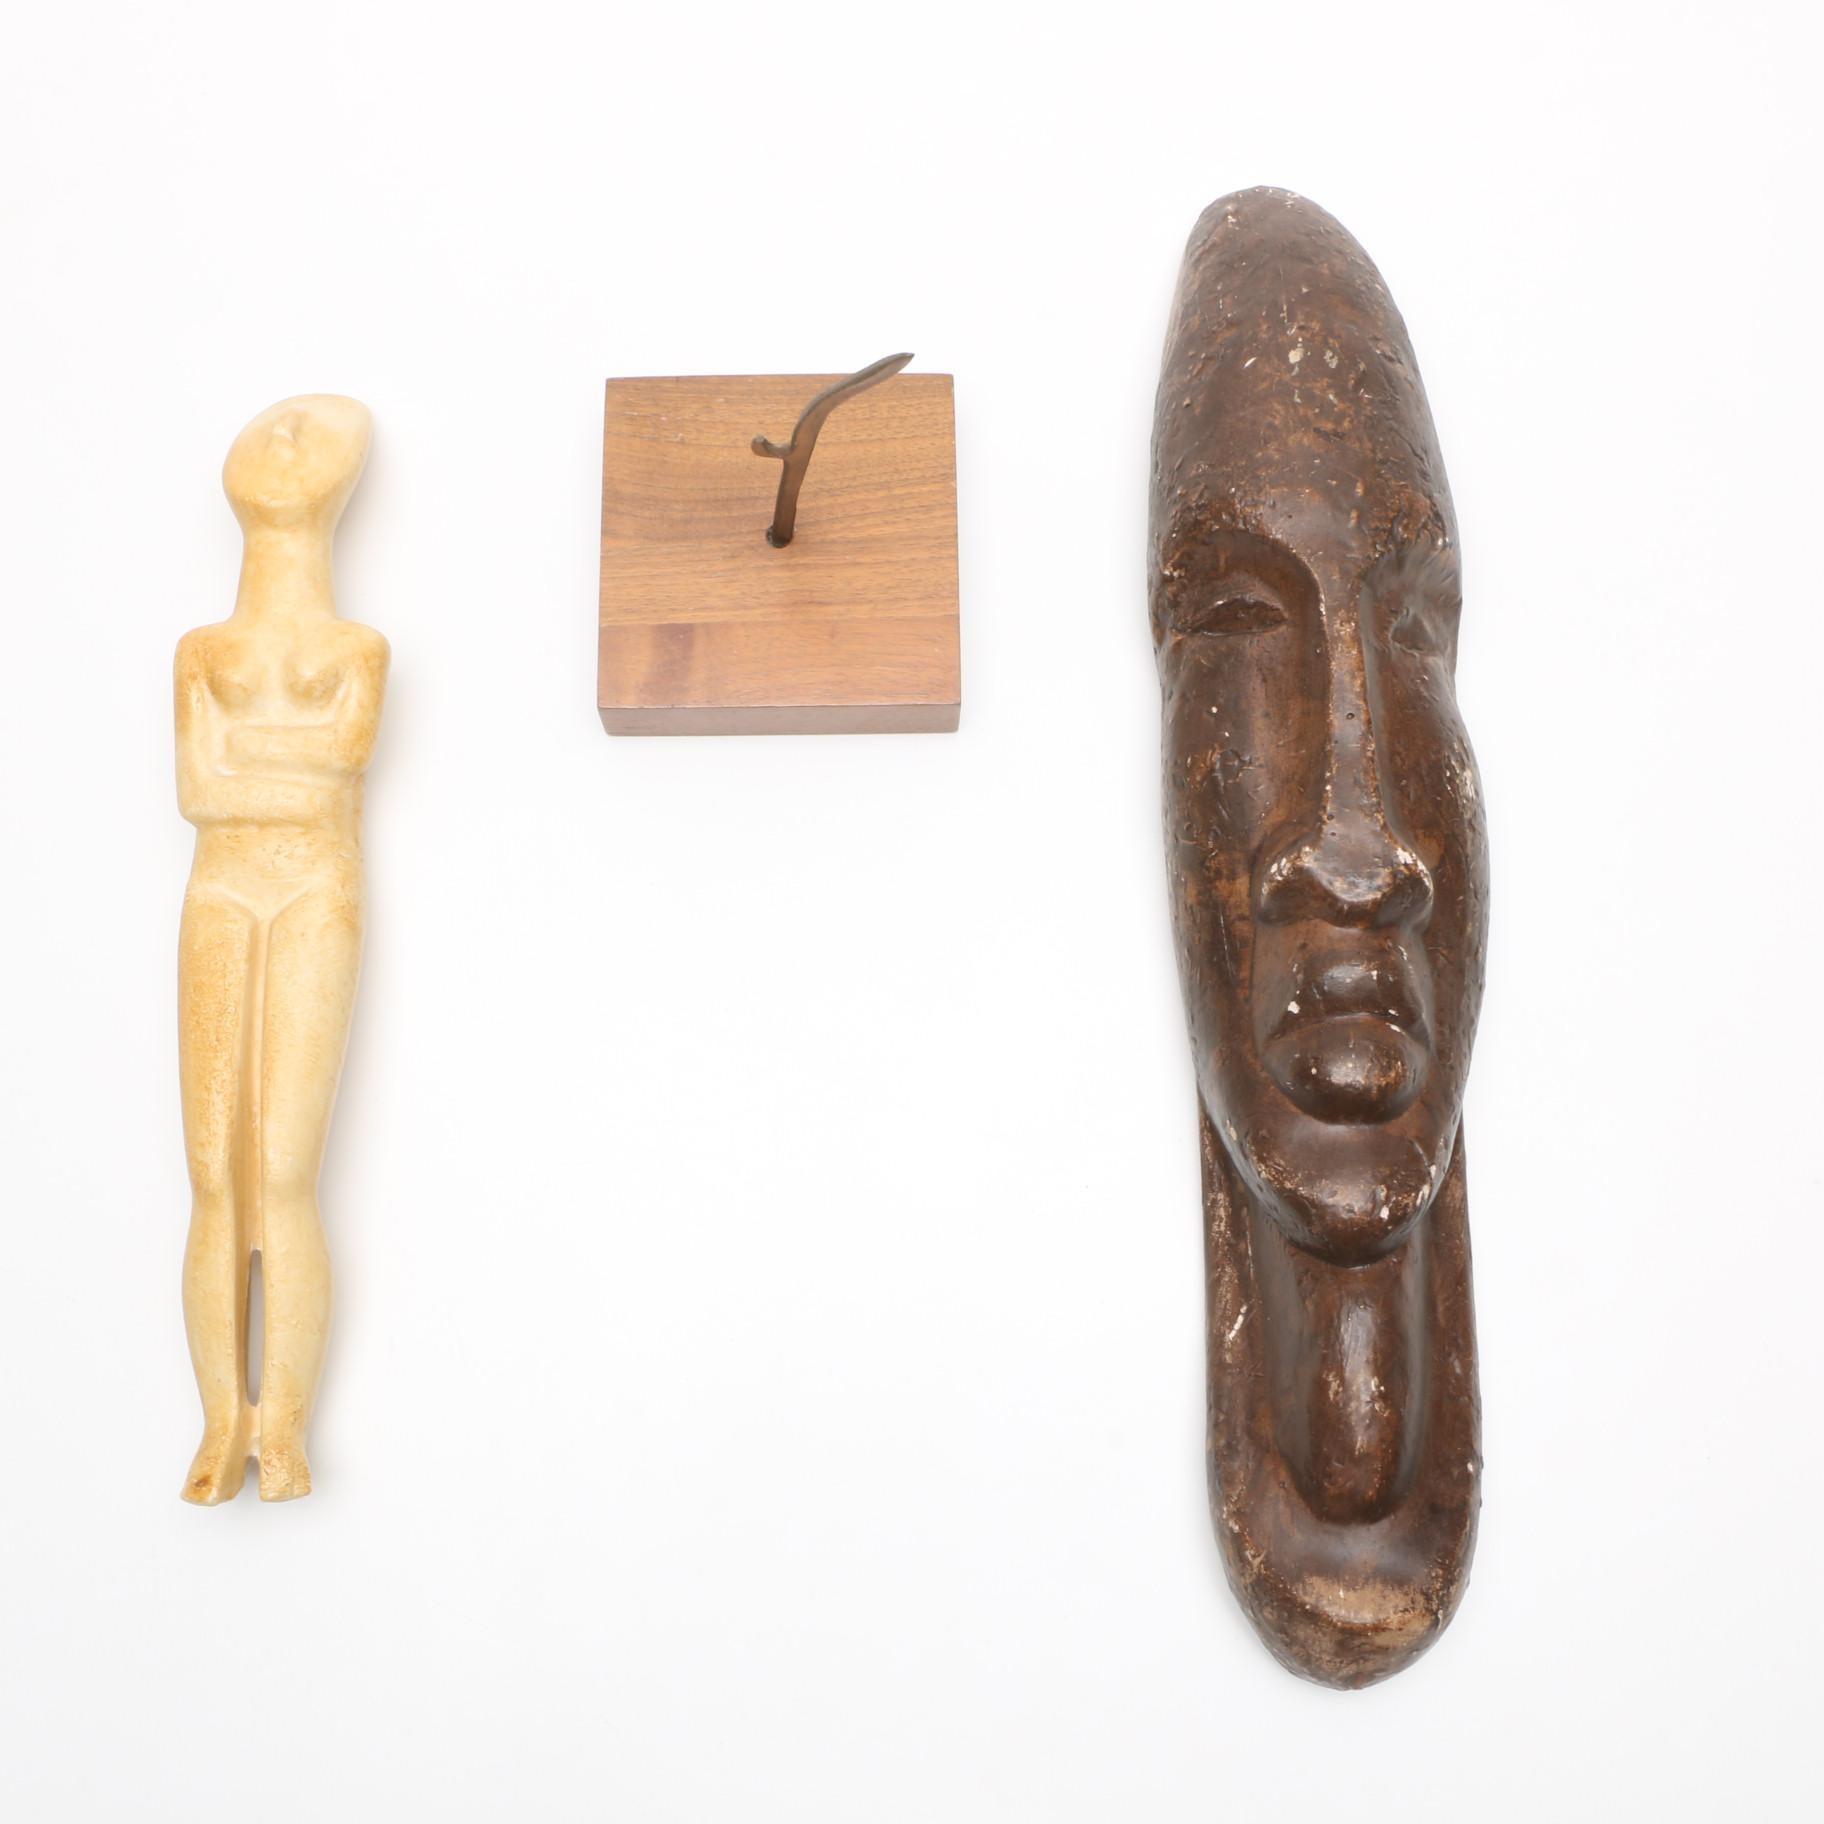 Stylized Figural Wood Decor